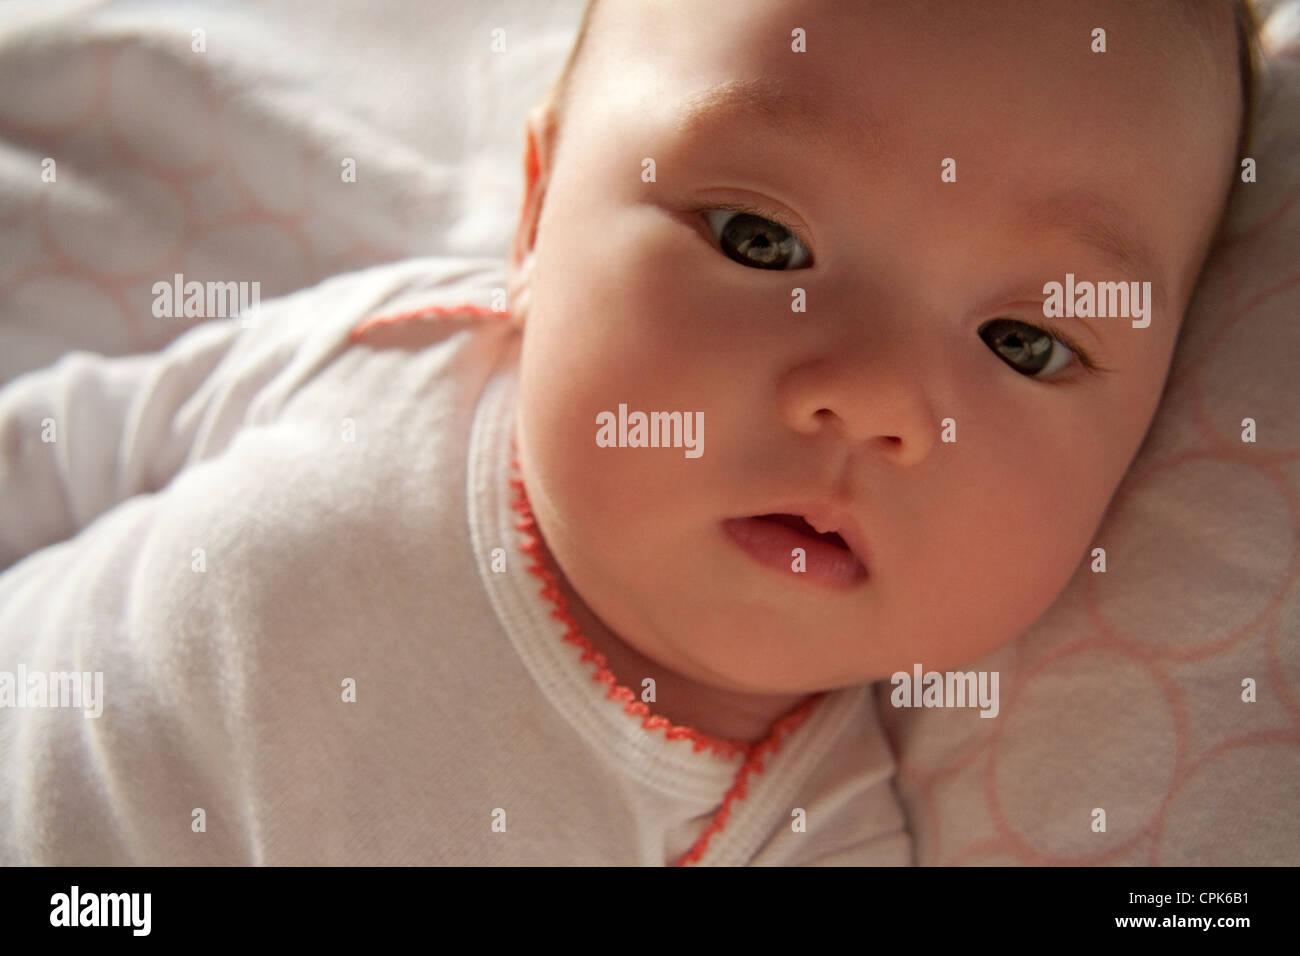 Deux mois baby girl Photo Stock